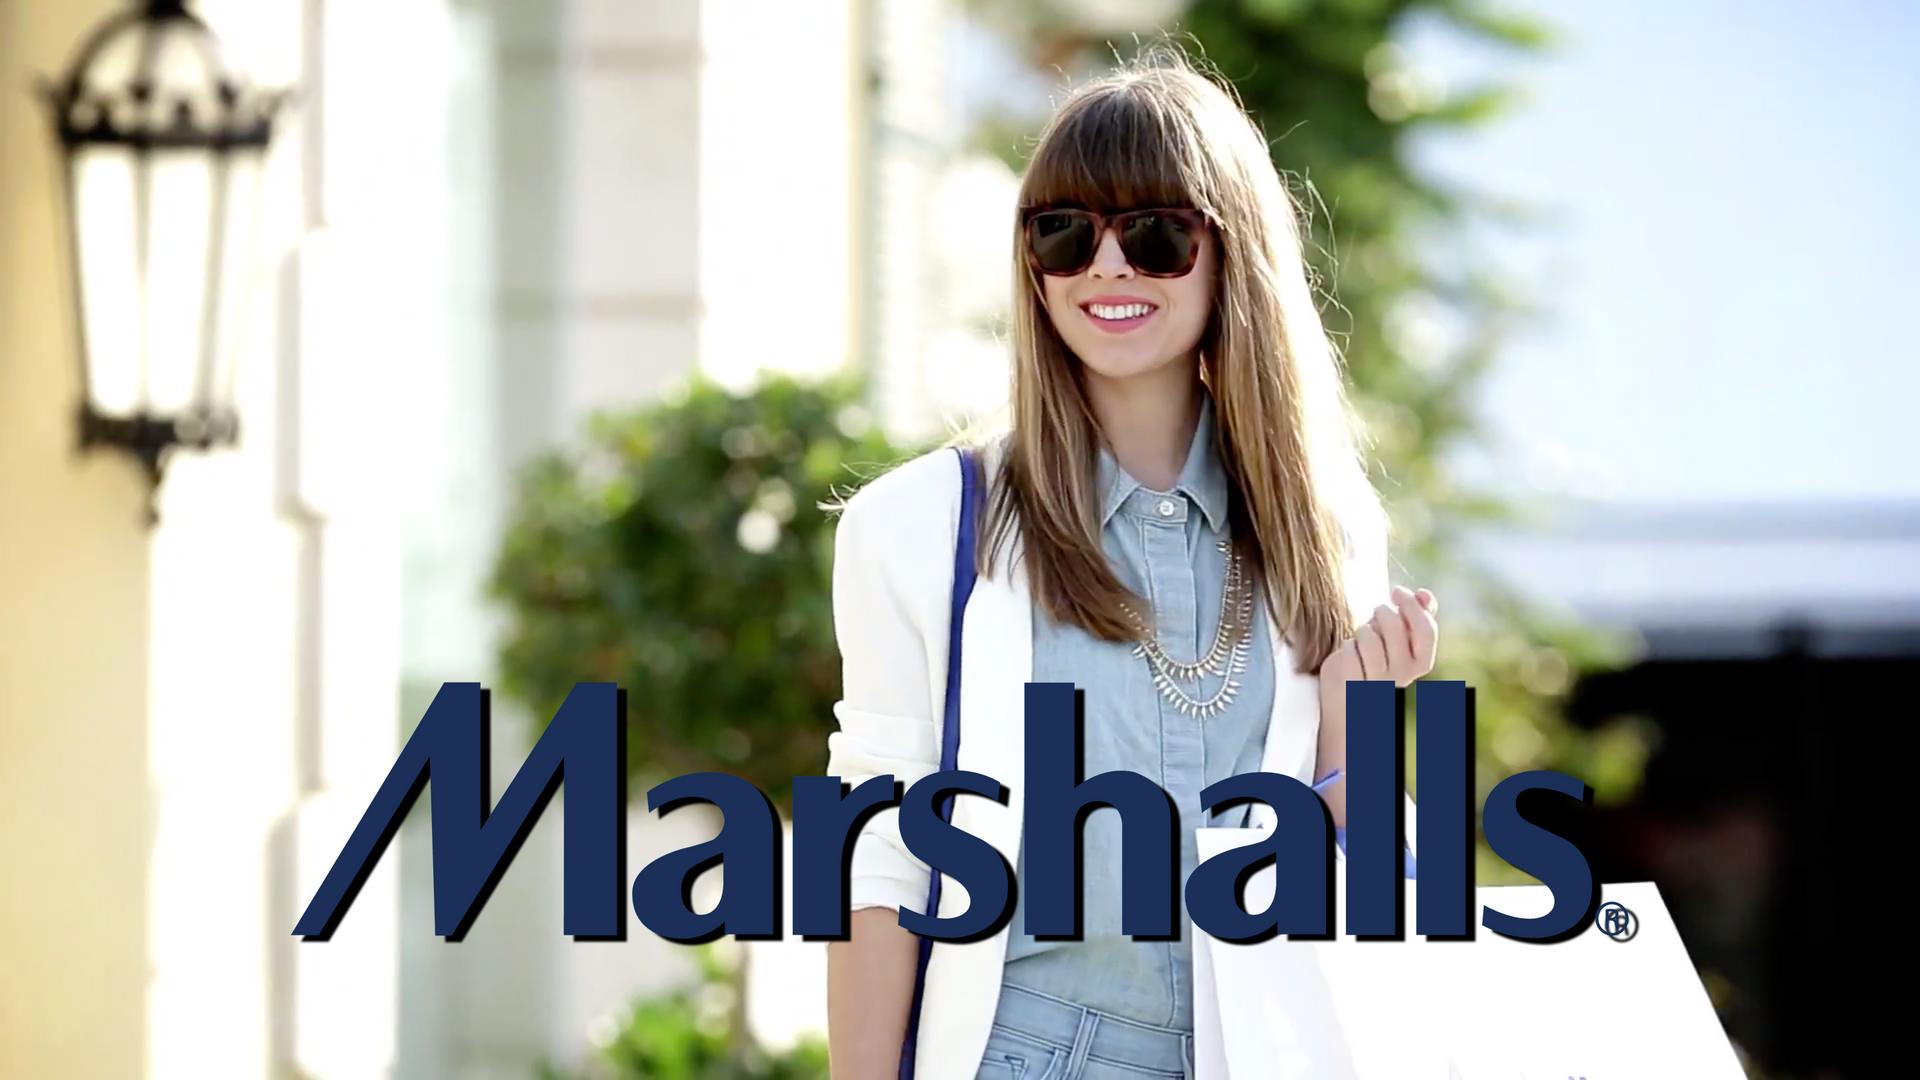 MARSHALLS 2.png